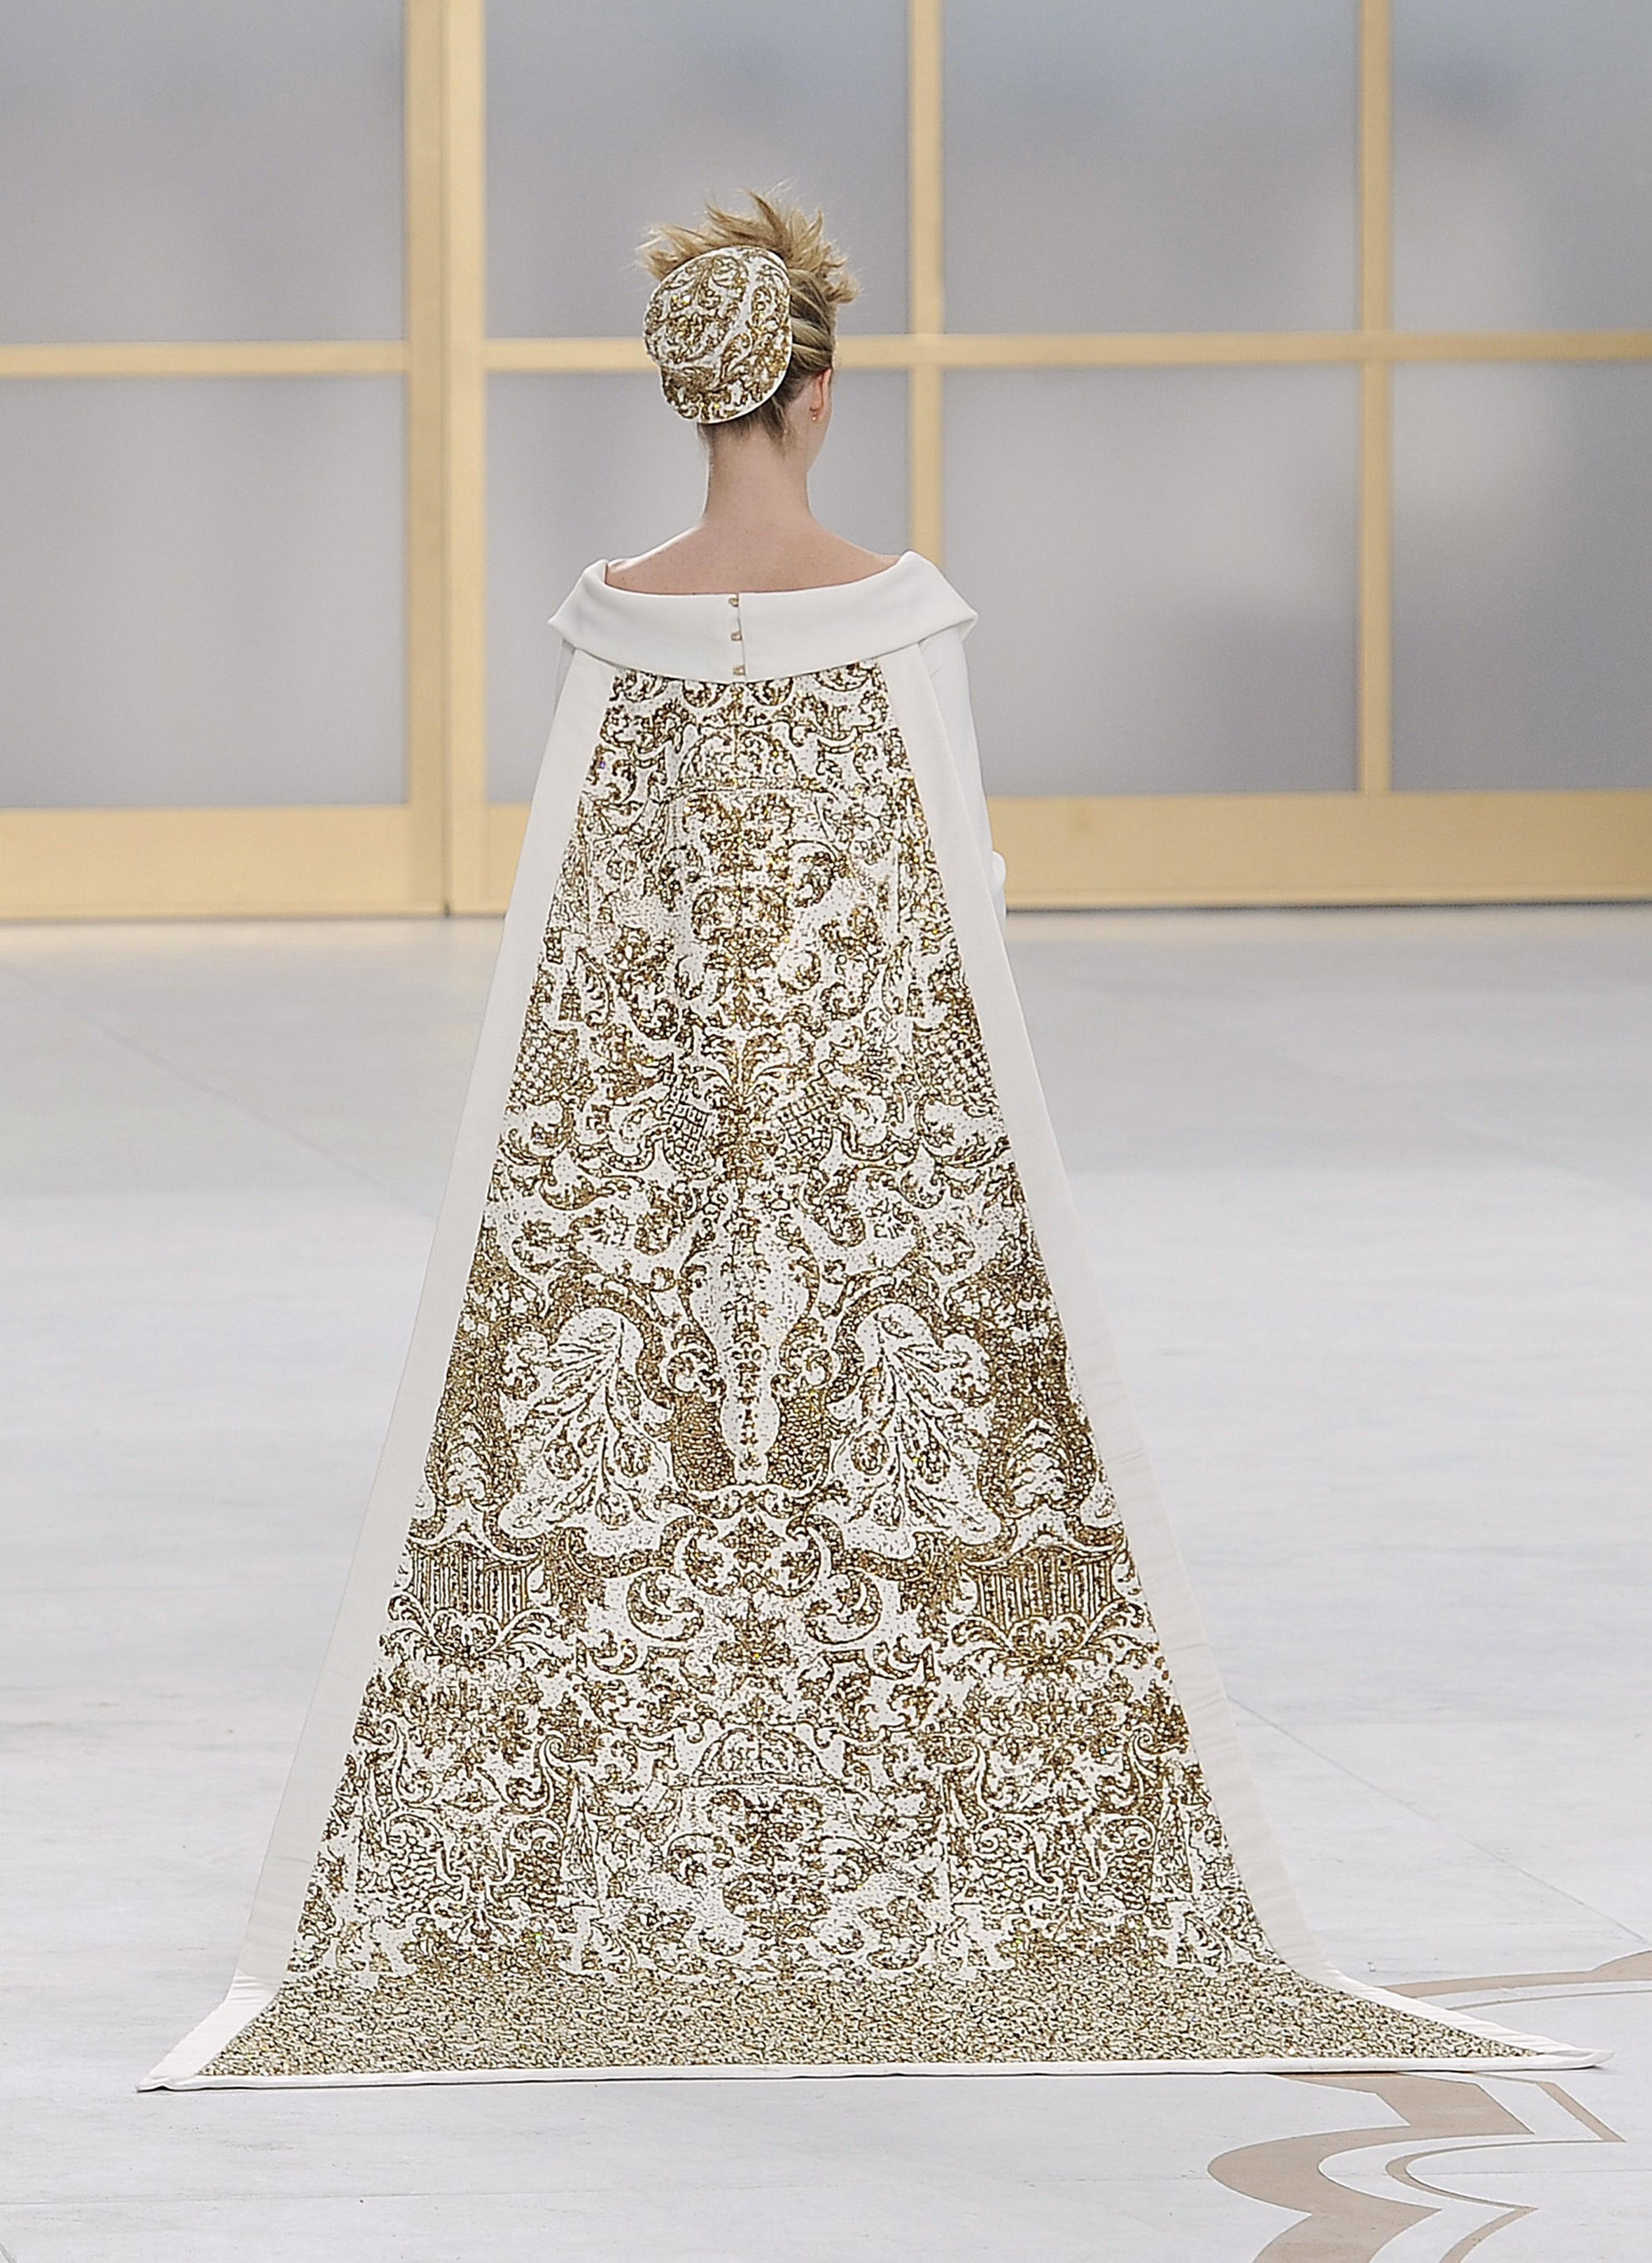 WeddingDress,KarlLagerfeldforHouseofChanel,Fall2014, Courtesy of The Metropolitan Museum of Art, photo by catwalking